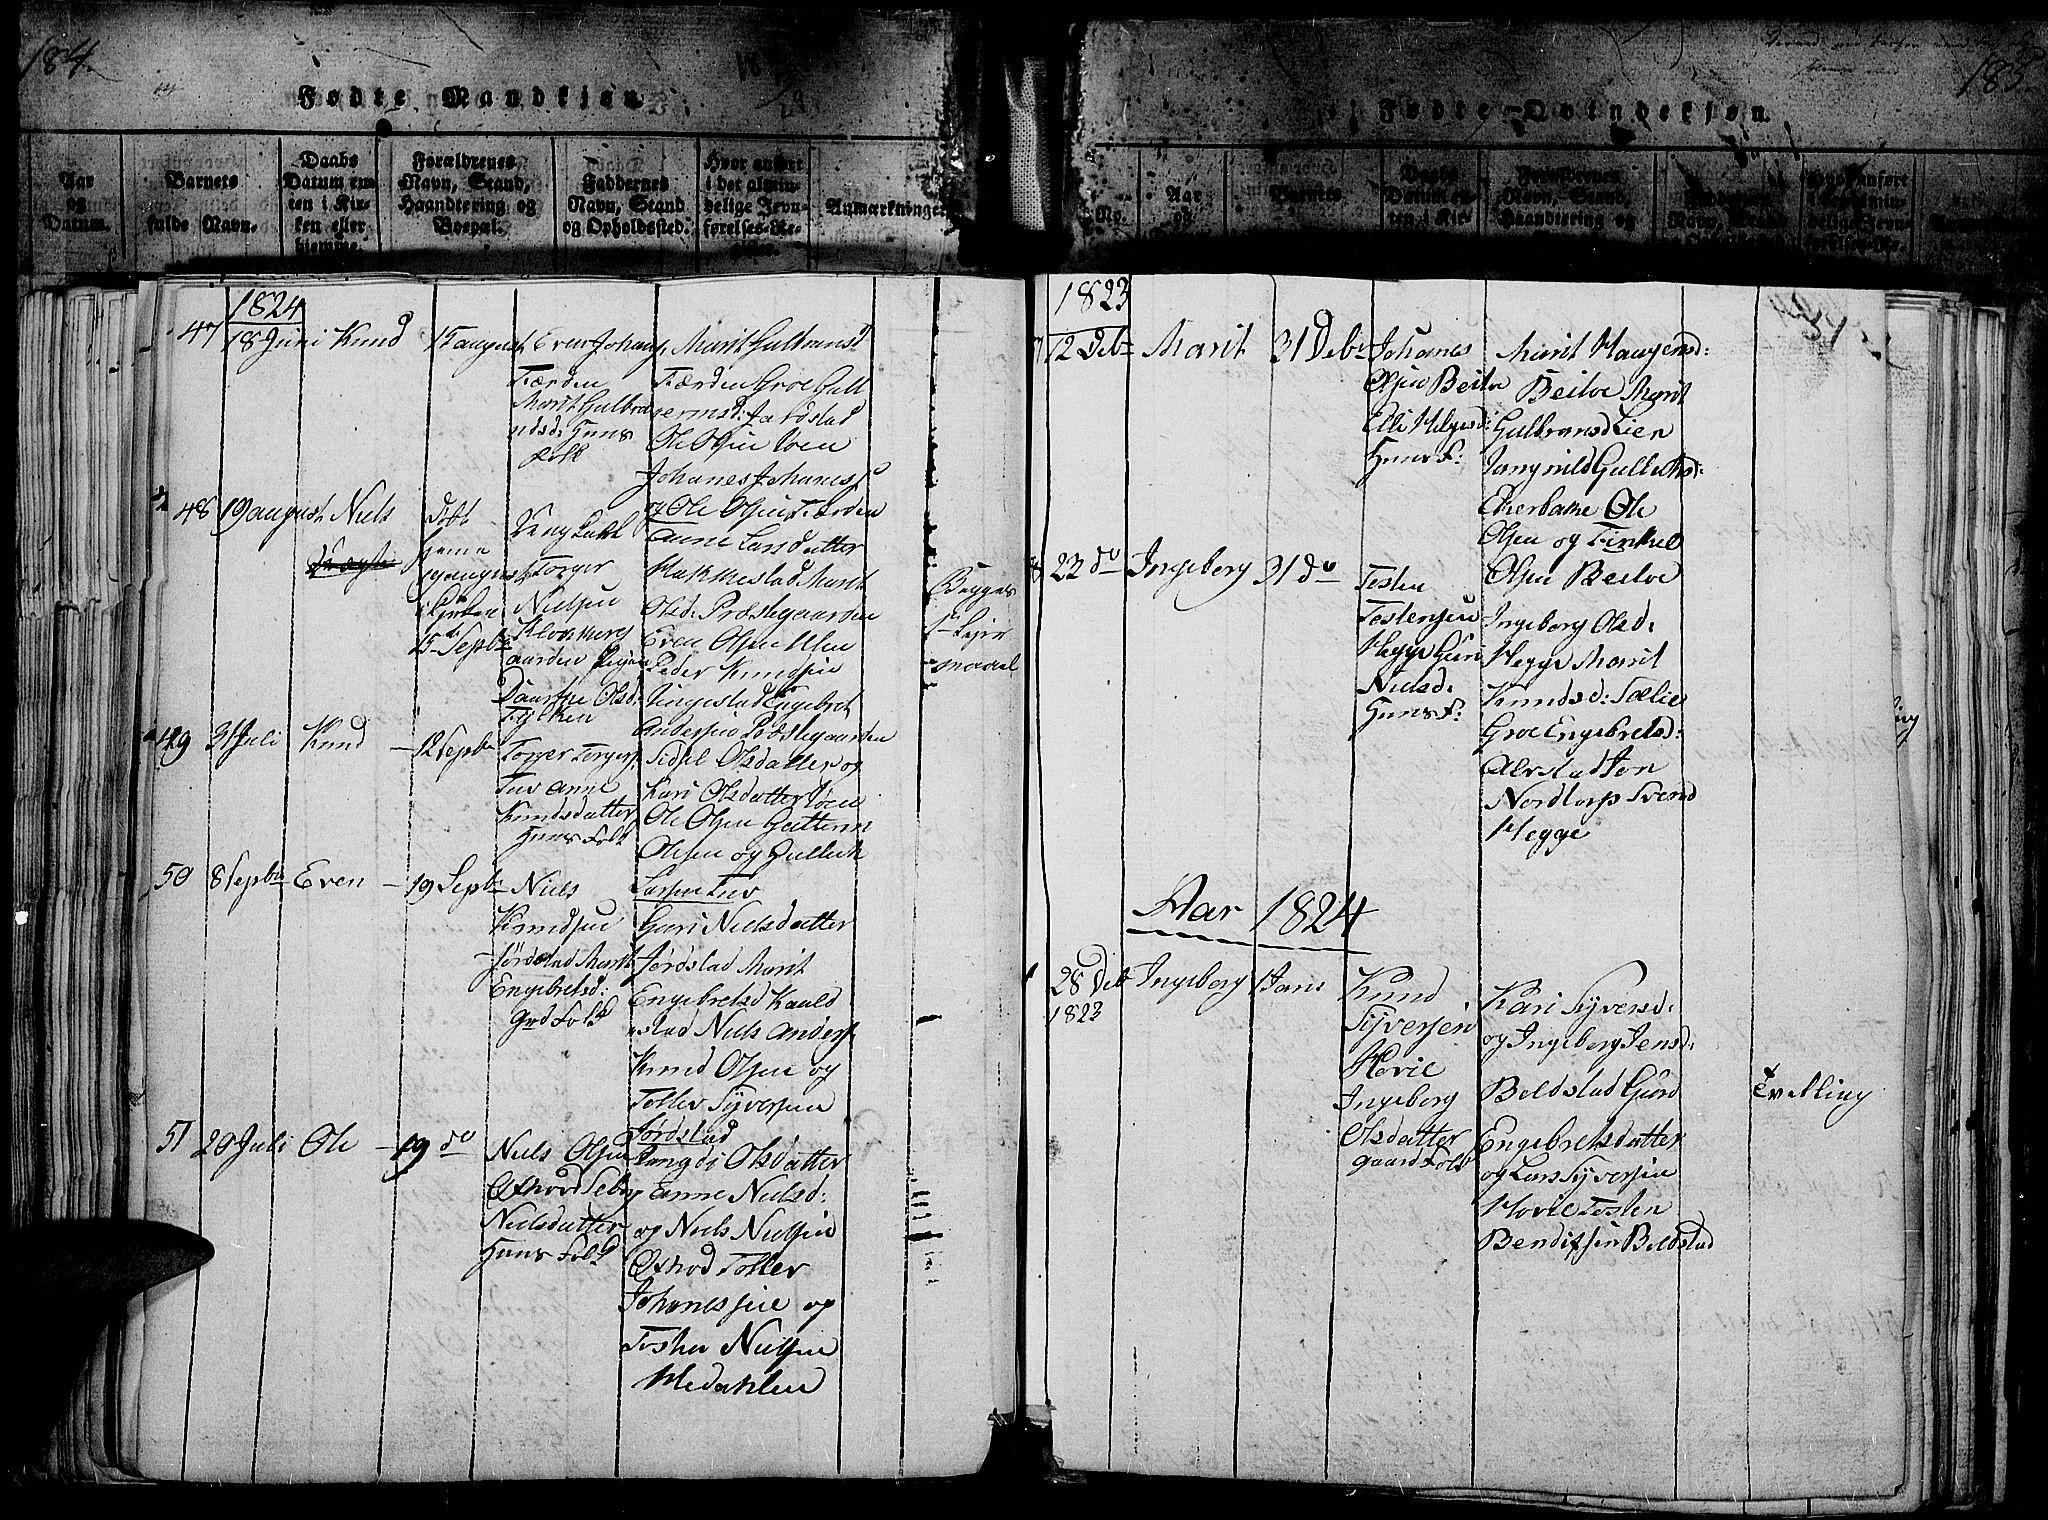 SAH, Slidre prestekontor, Ministerialbok nr. 2, 1814-1830, s. 185z